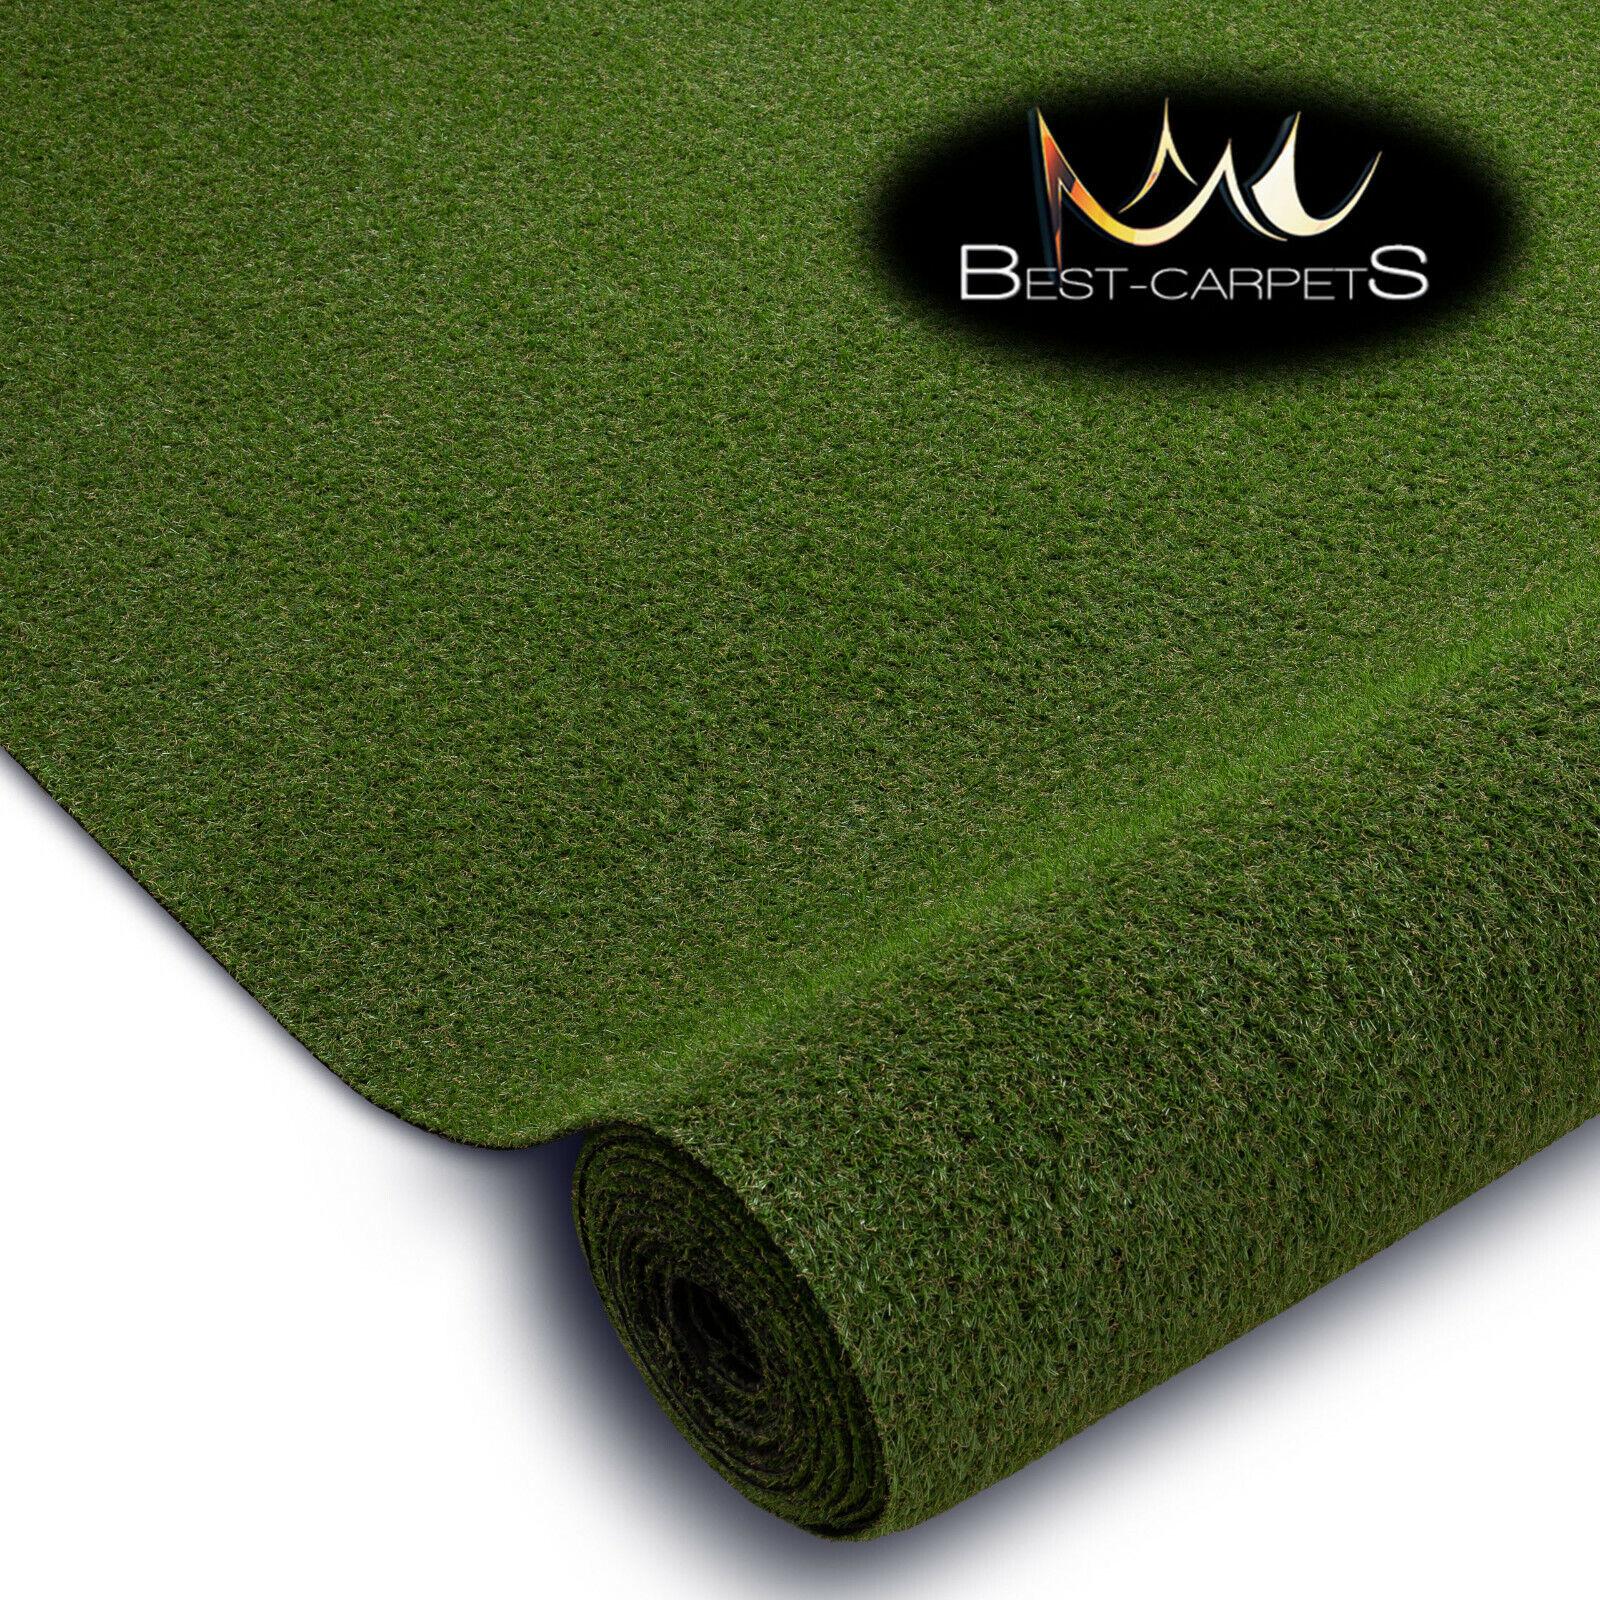 Artificial Lawn 'ELIT' grön Grass, Cheap Wiper, Turf Garden, Best Quality